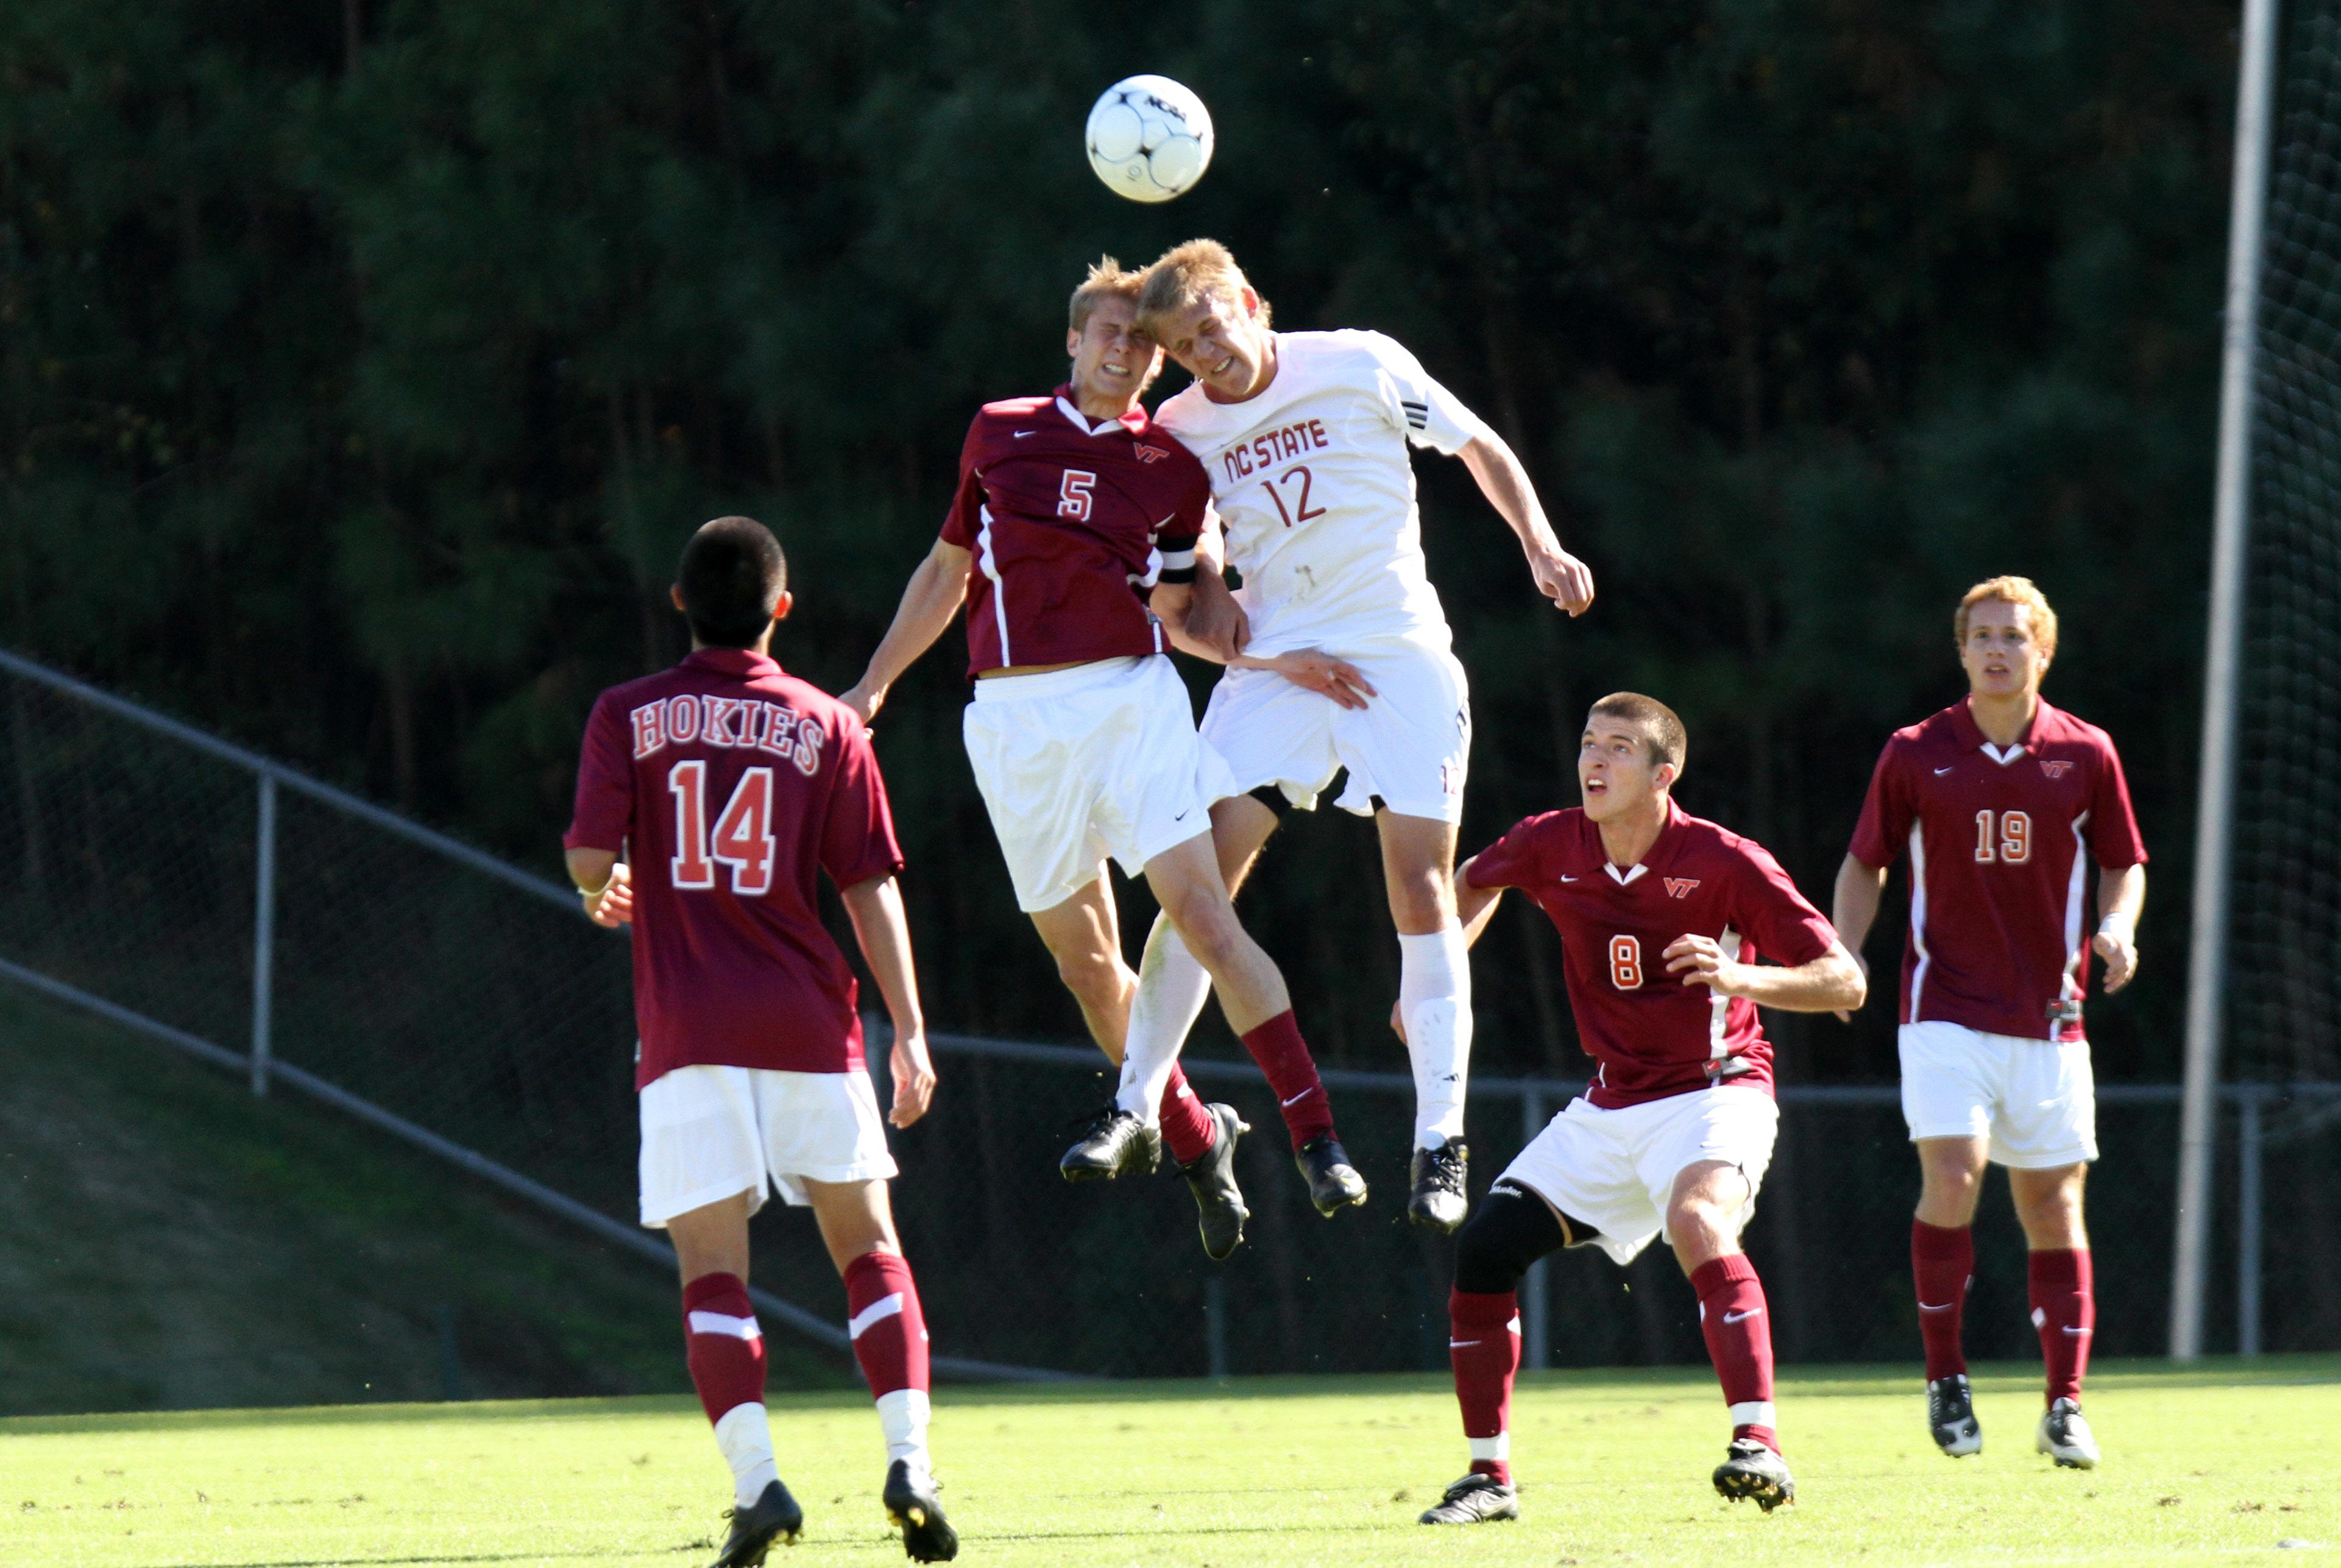 NCAA SOCCER: NOV 09 ACC Play-In Game - NC State v Virginia Tech